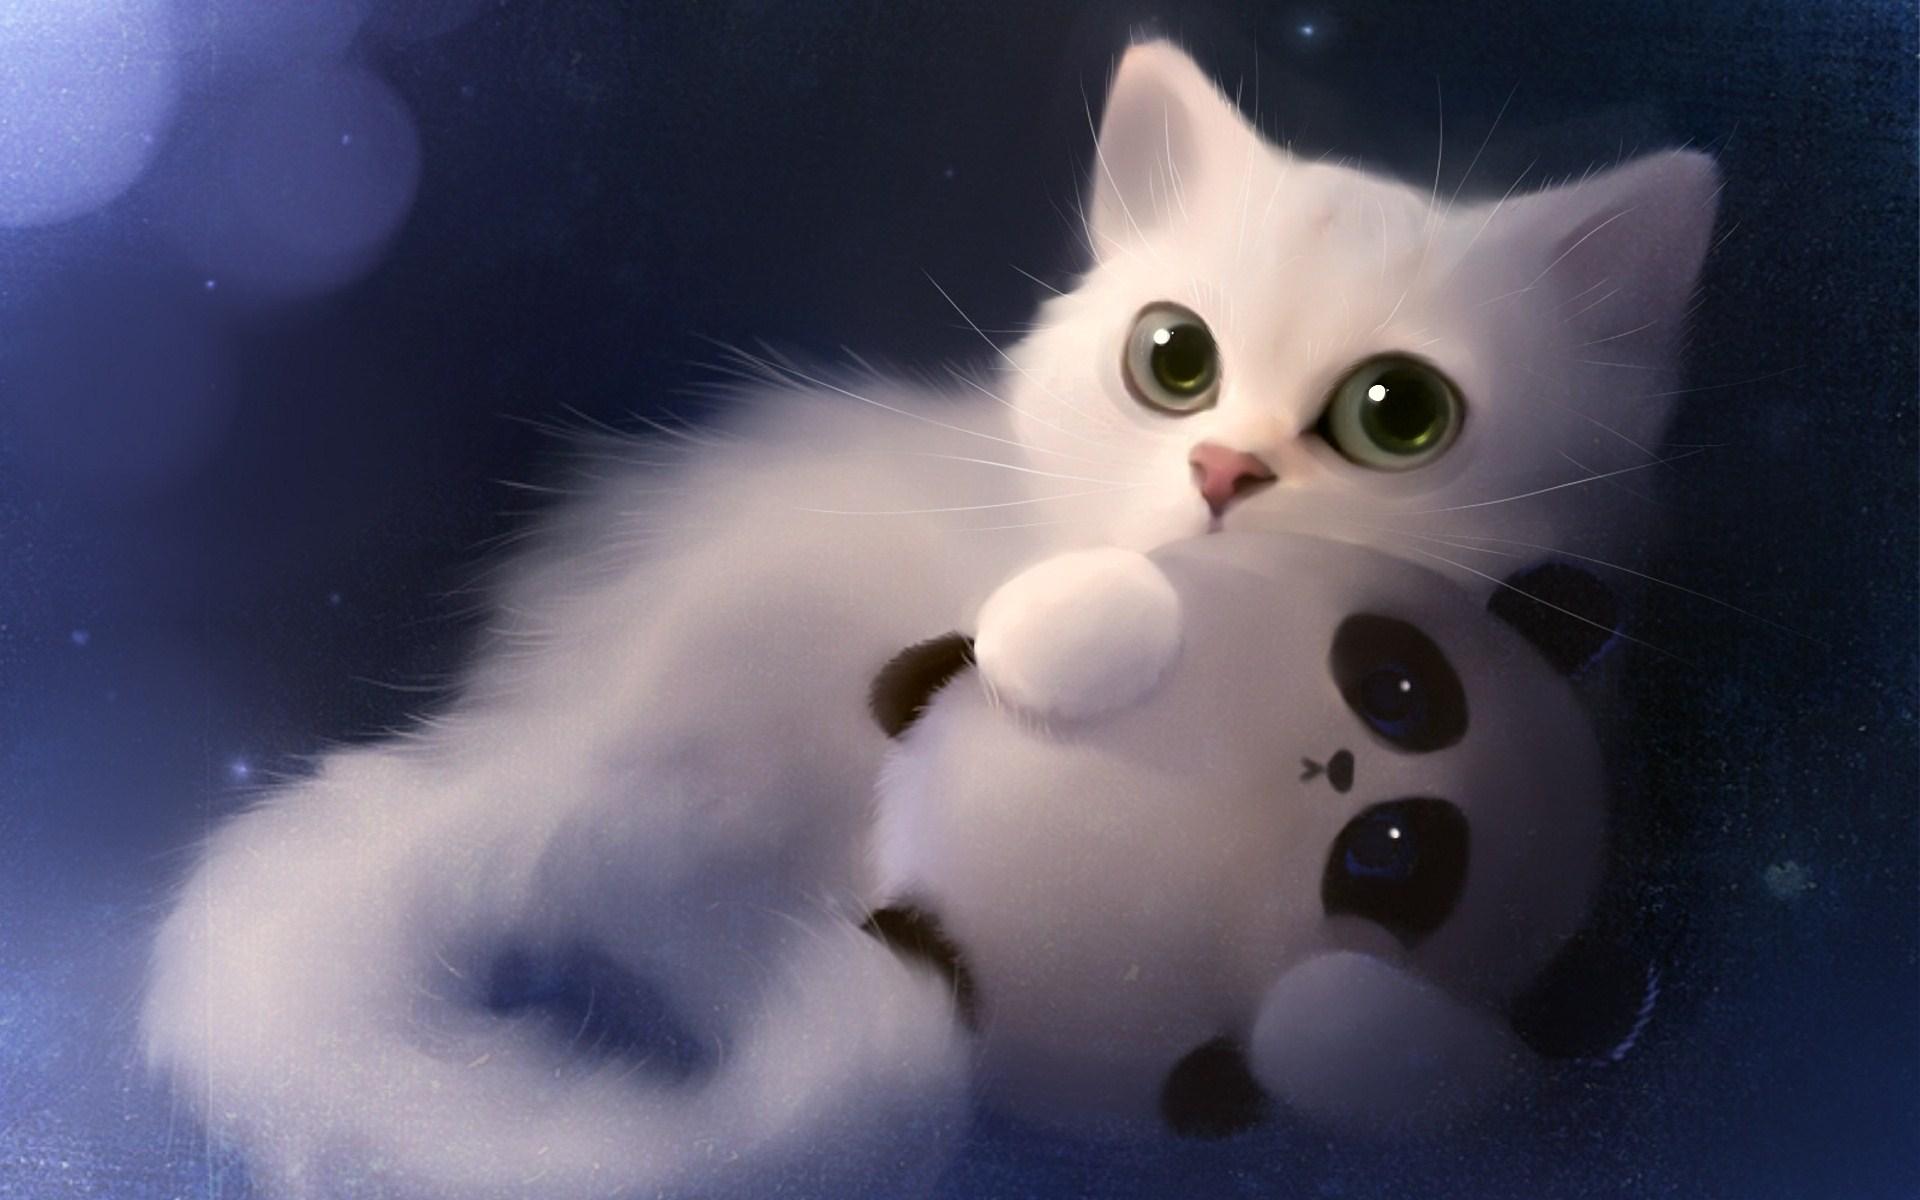 Download Cute HD wallpaper for laptop and desktop